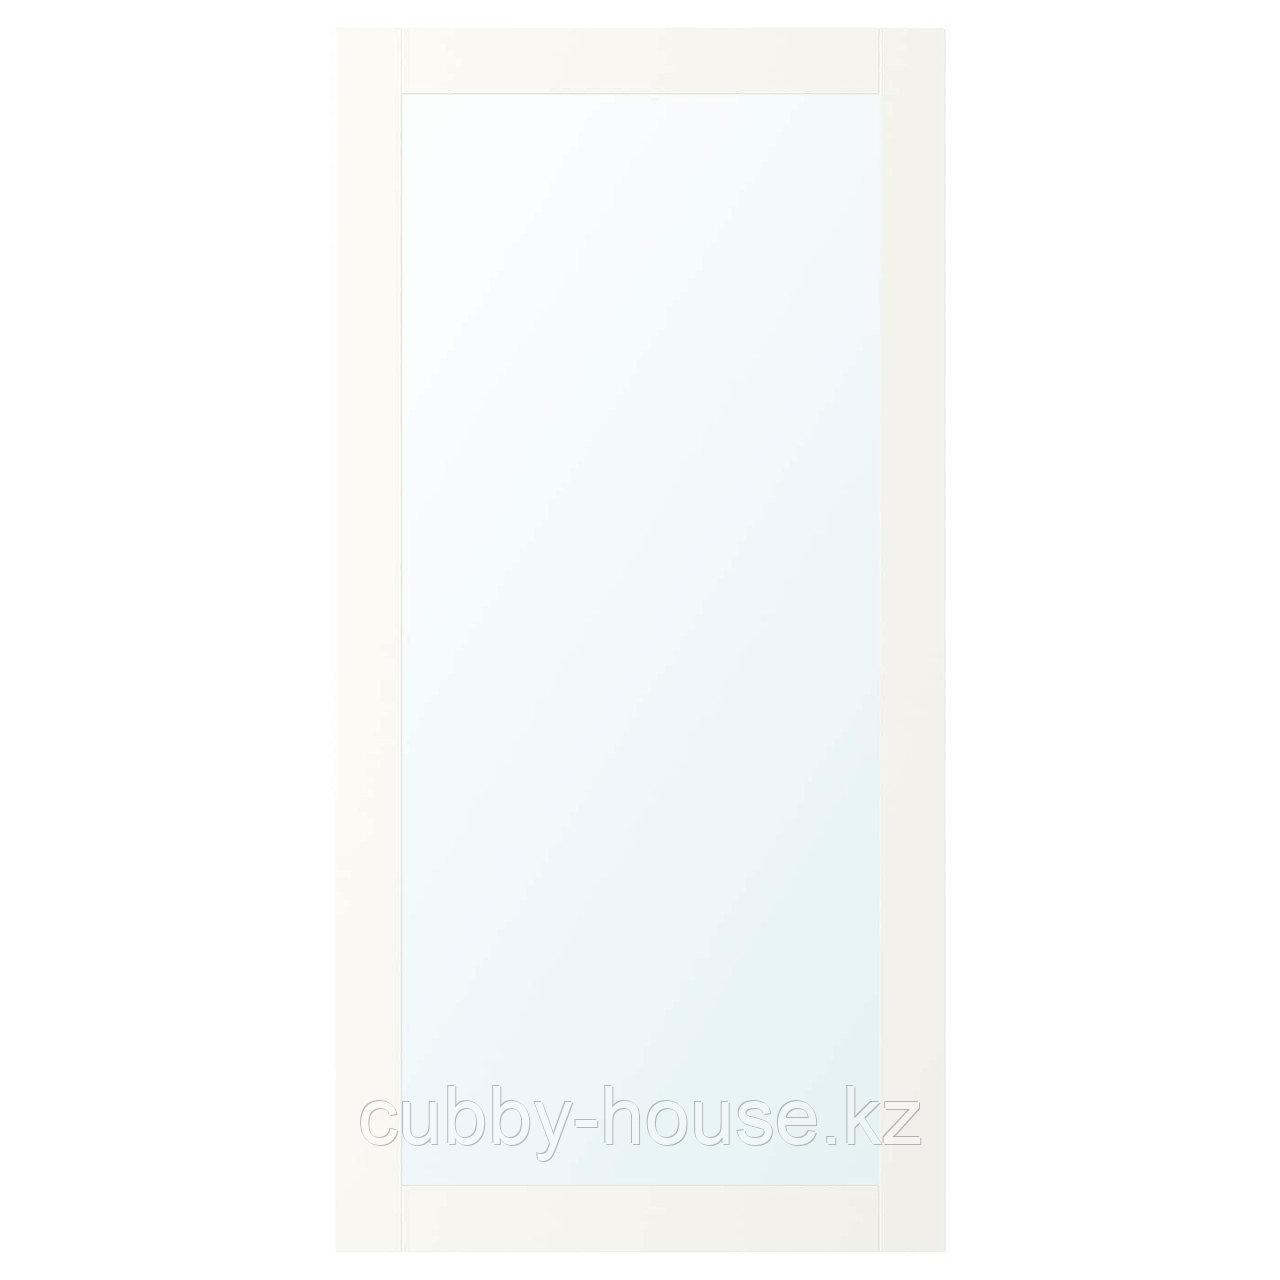 РИДАБУ Дверца с петлями, белый, 60x120 см